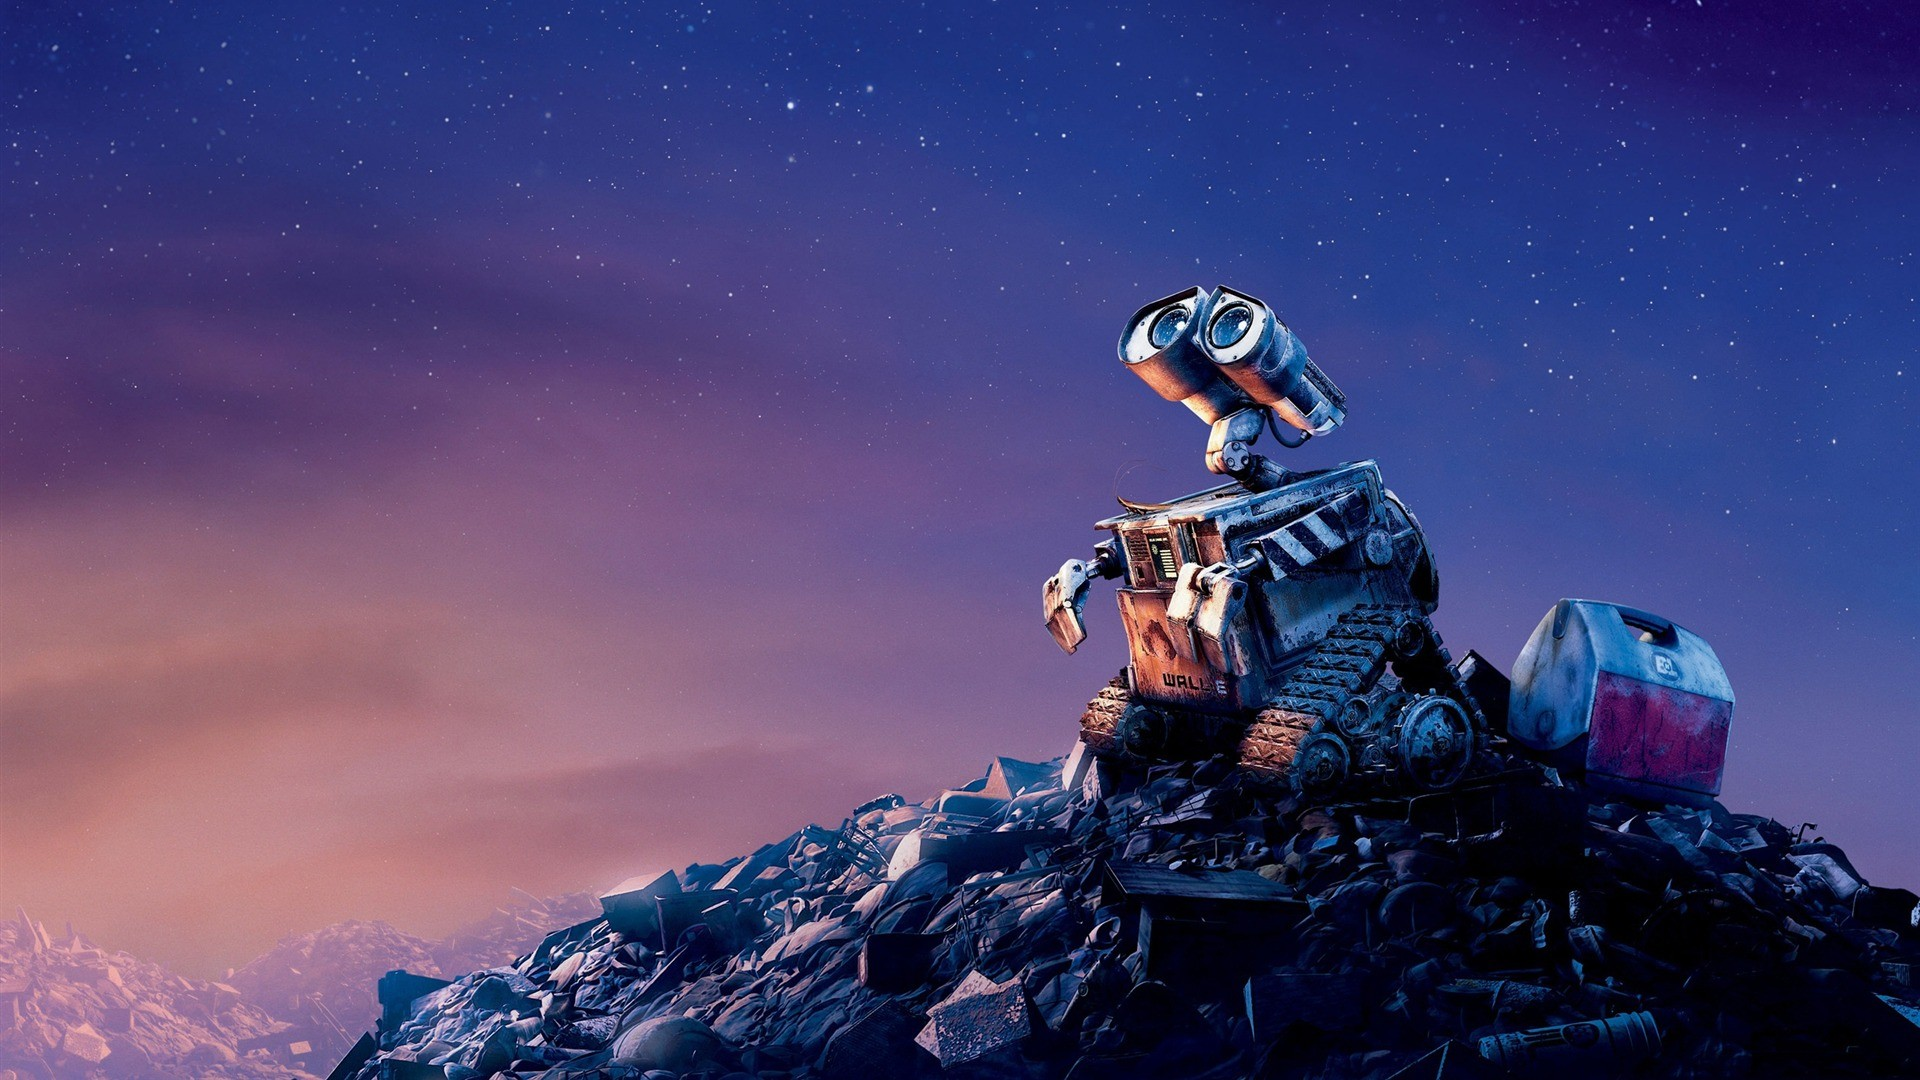 64+ Disney wallpapers ·① Download free amazing full HD ...